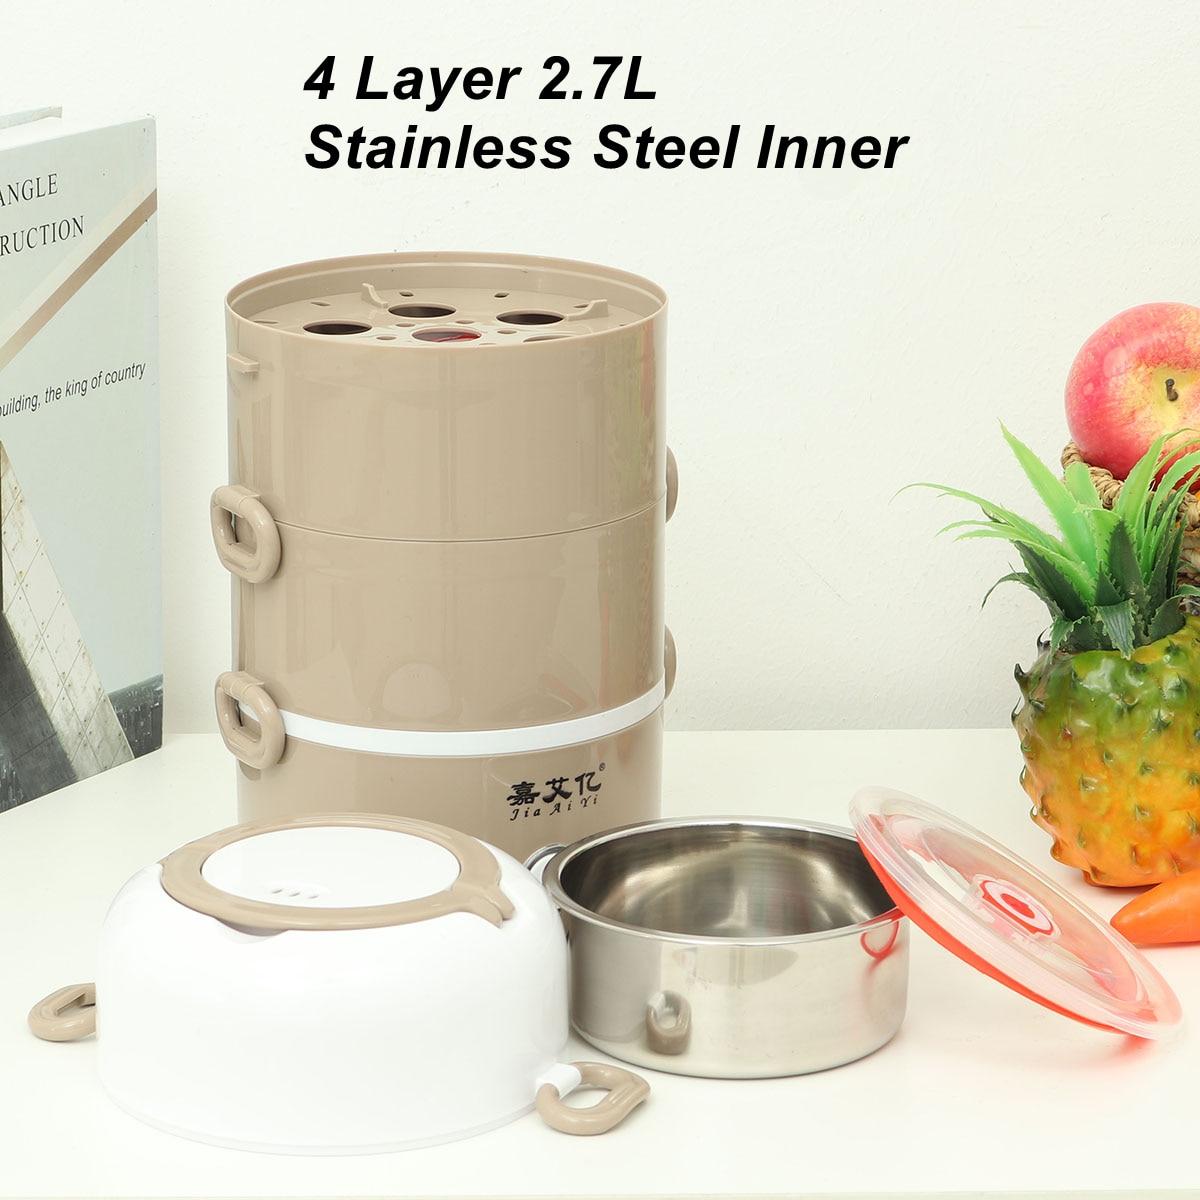 2.7L 220 فولت صندوق غداء كهربي ستانلس ستيل محمول جهاز طهي الأرز عبوات طعام حافظة للحرارة باخرة مكتب طالب بينتو صندوق 4 طبقة